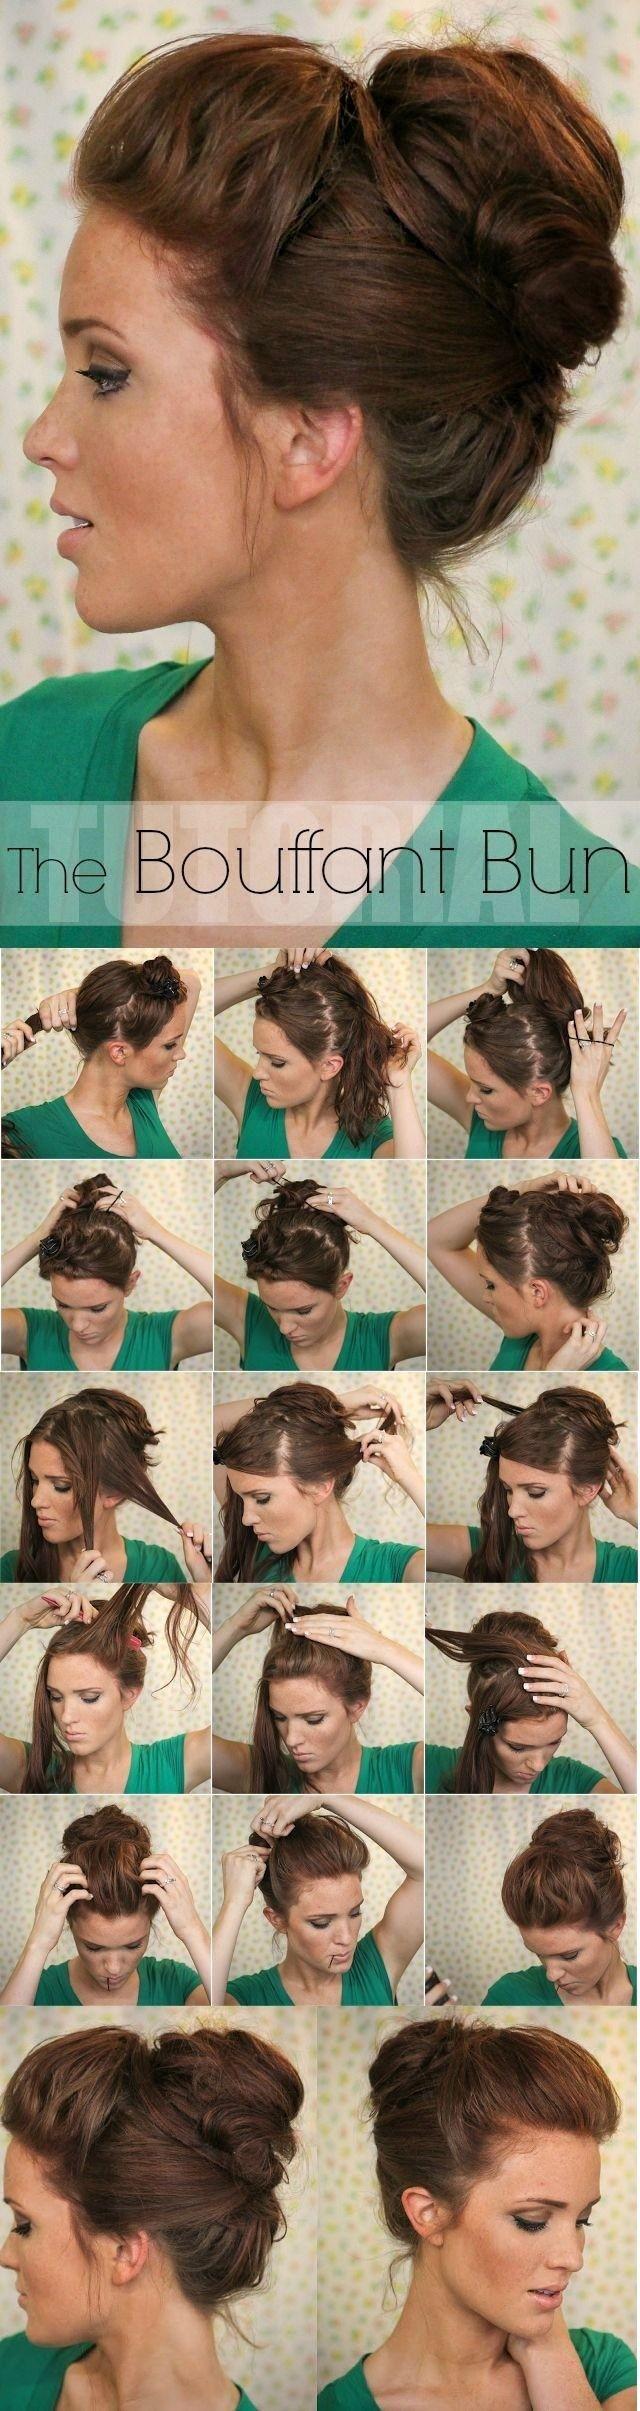 Super Easy Updo Hairstyles Tutorials: Bouffant Bun